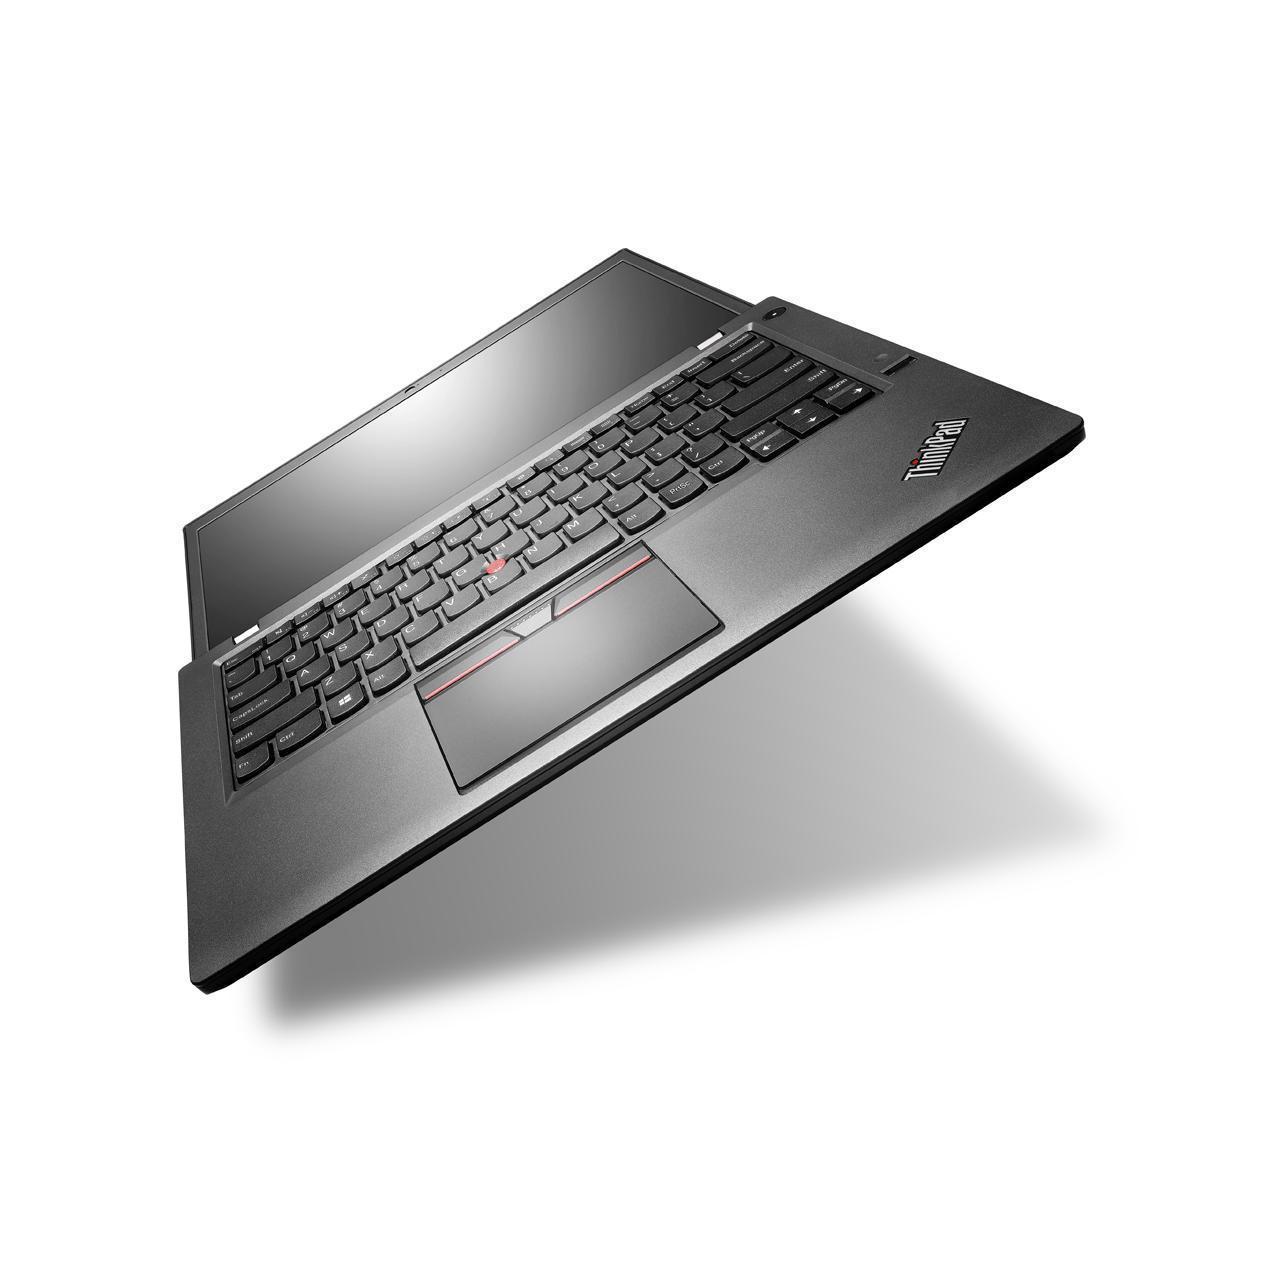 Lenovo ThinkPad T450s 14-inch (2015) - Core i7-5600U - 12 GB  - SSD 512 GB